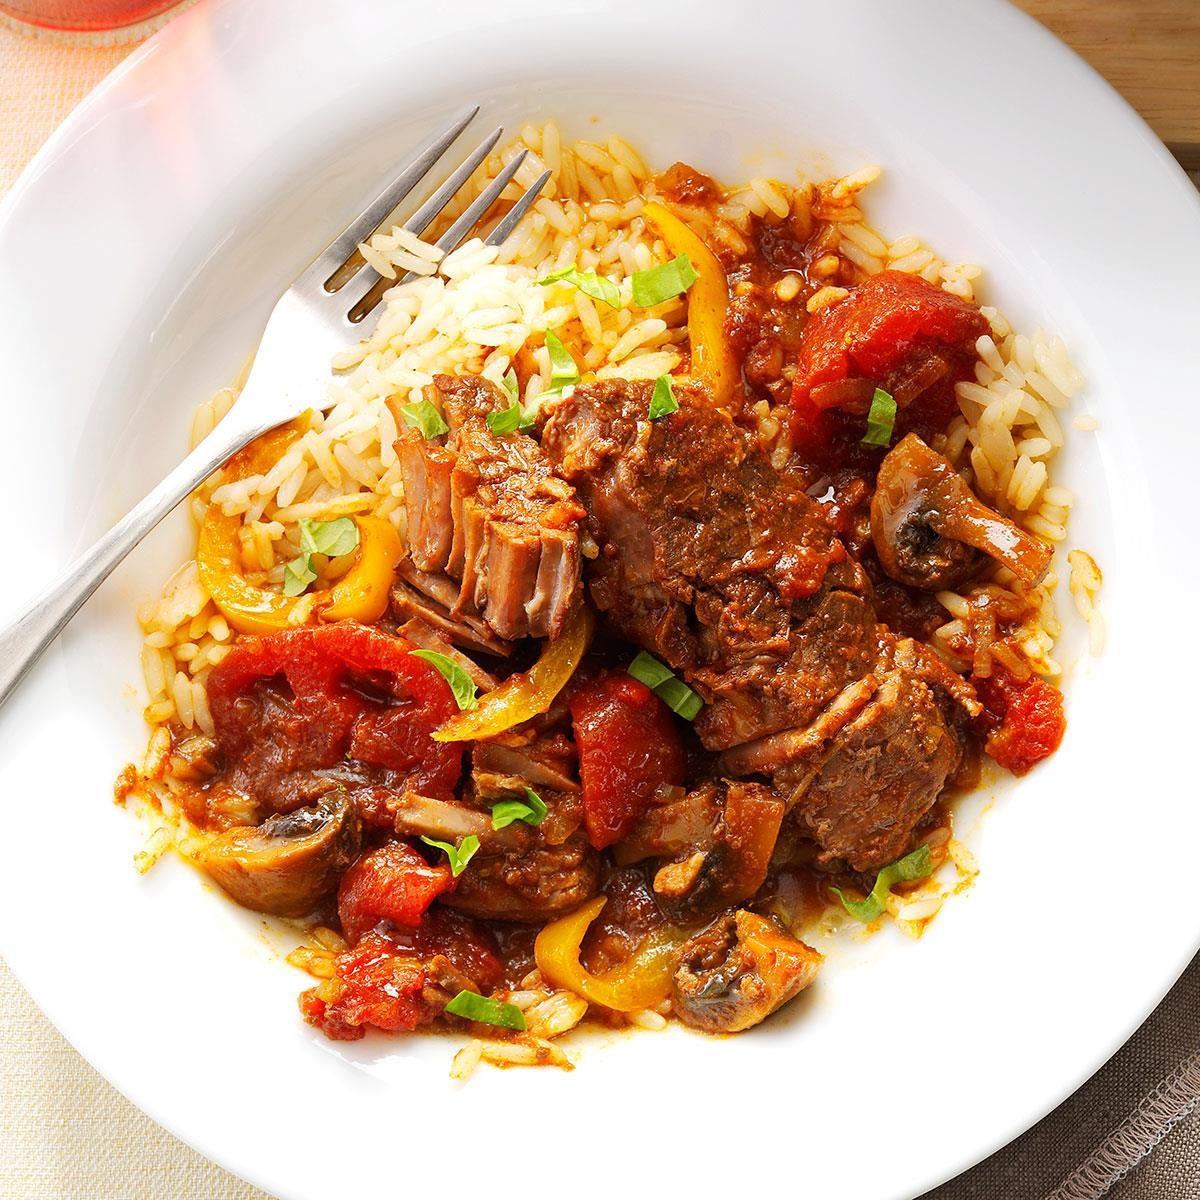 Wednesday: Tomato-Basil Steak